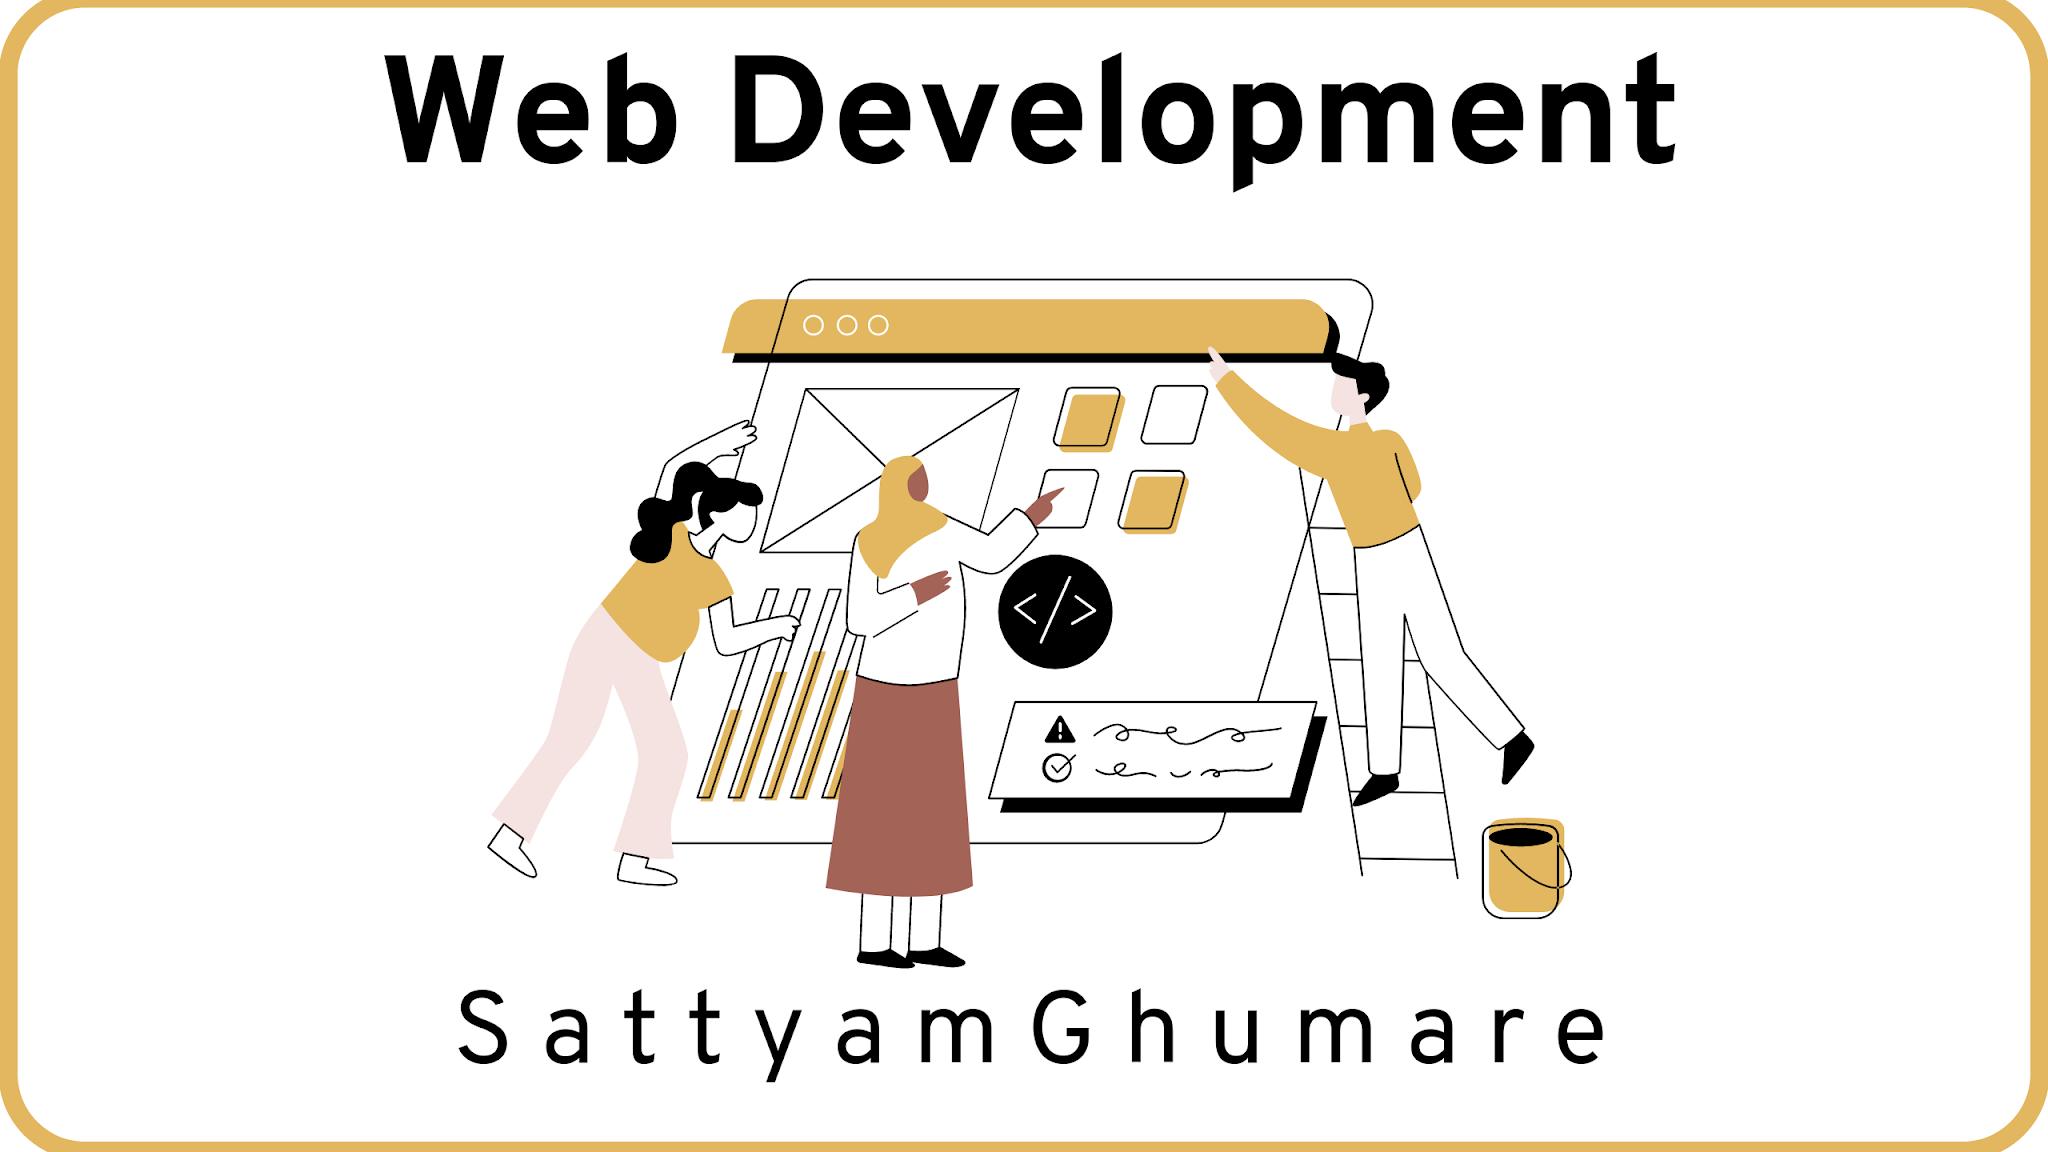 What is Web Development